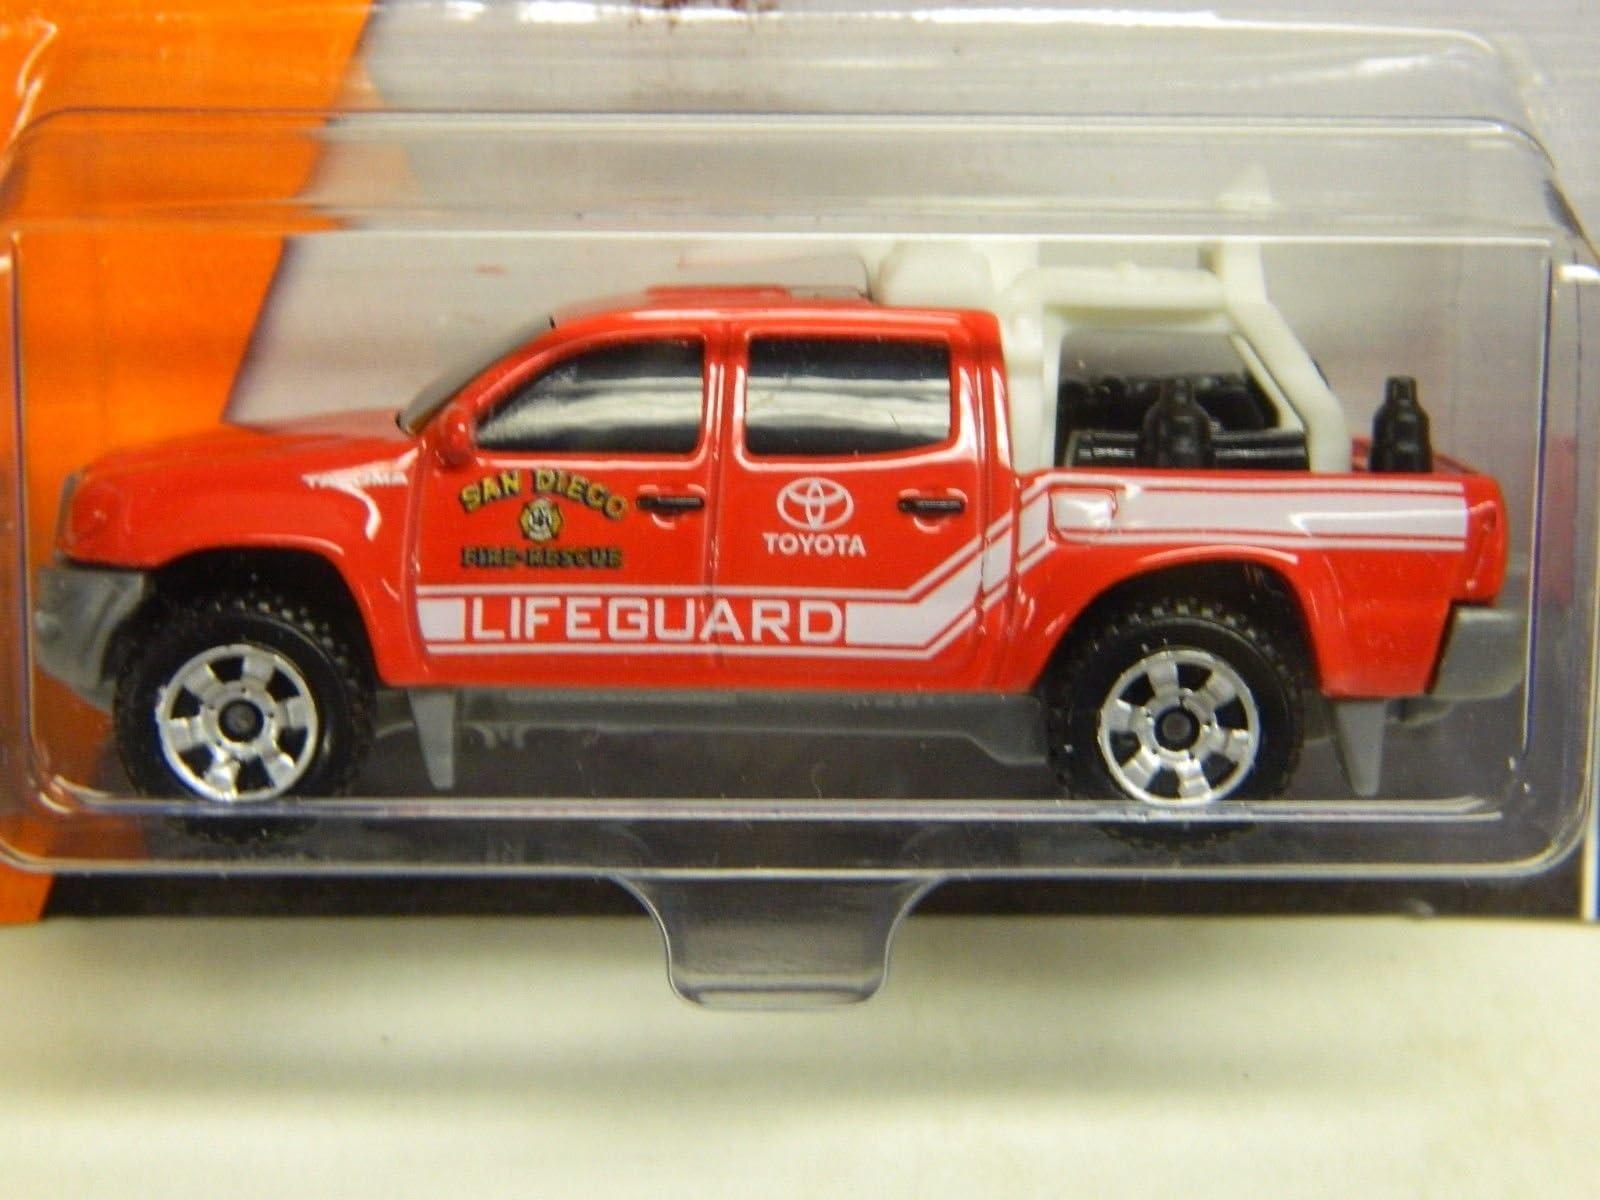 NEW Matchbox #59 Toyota Tacoma San Diego Beach Lifeguard Fire Rescue Truck